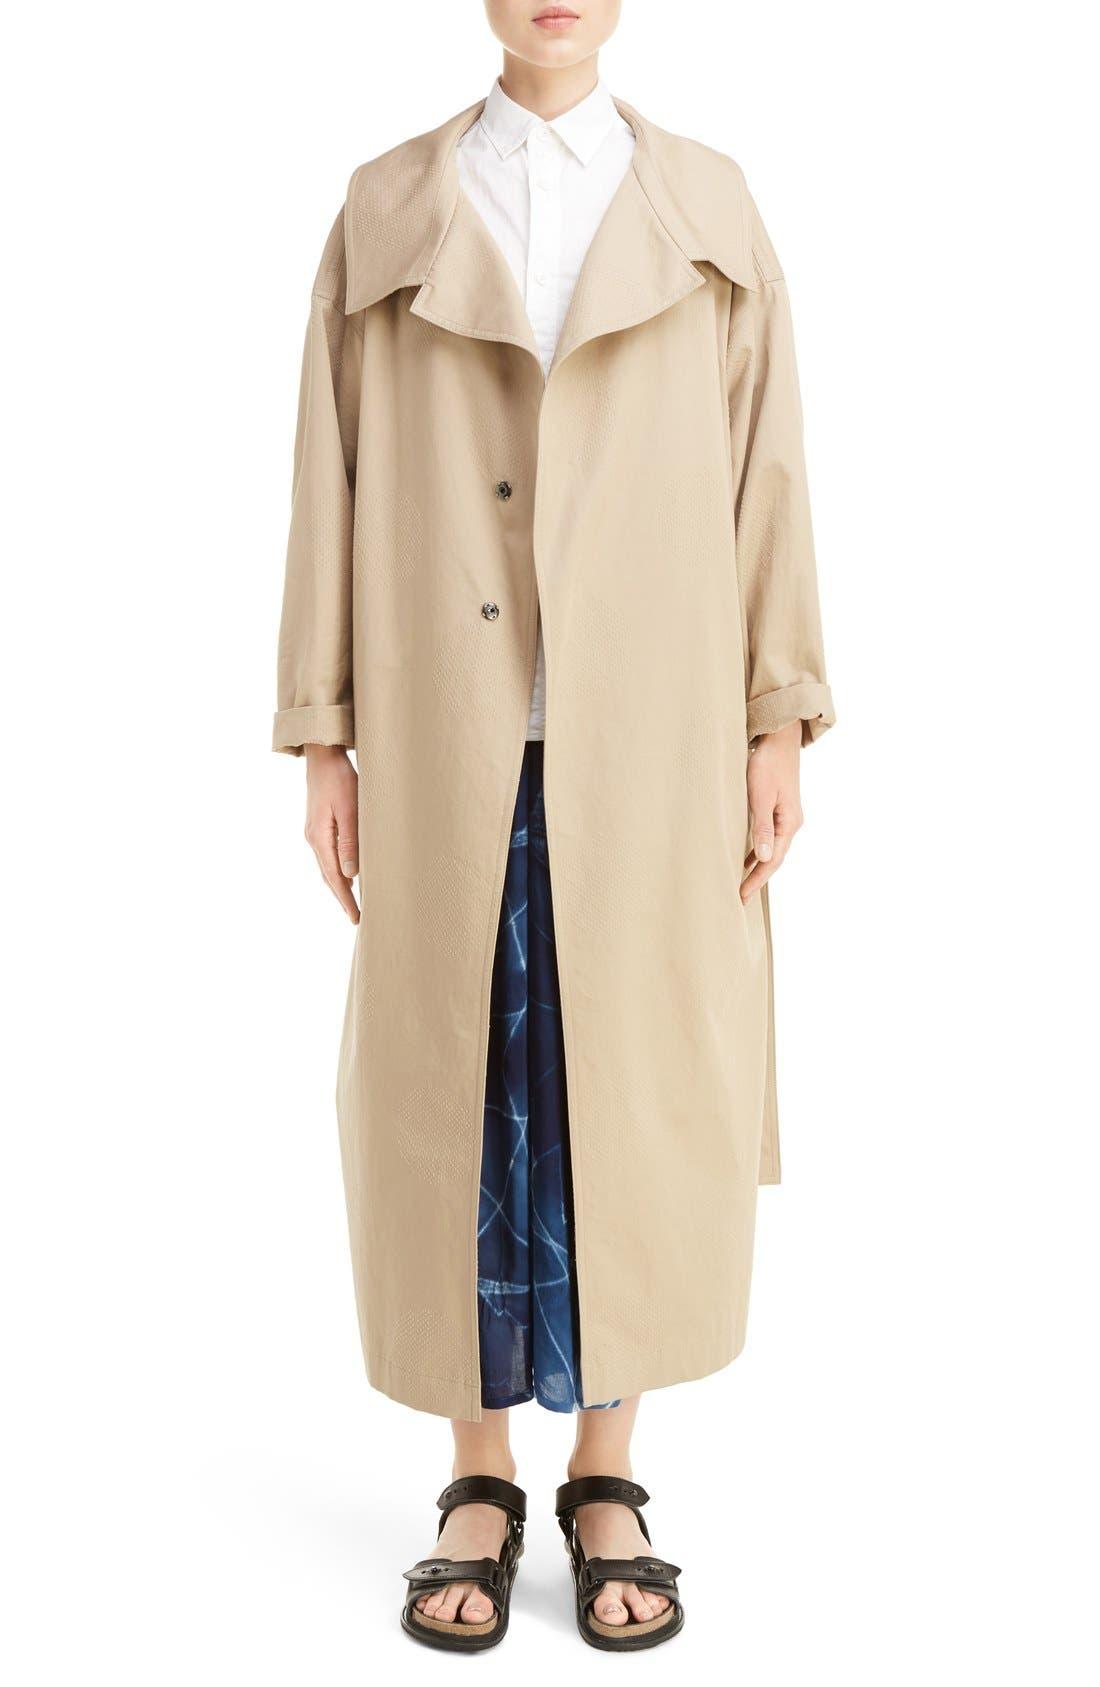 U-Gown Coat,                             Main thumbnail 1, color,                             250